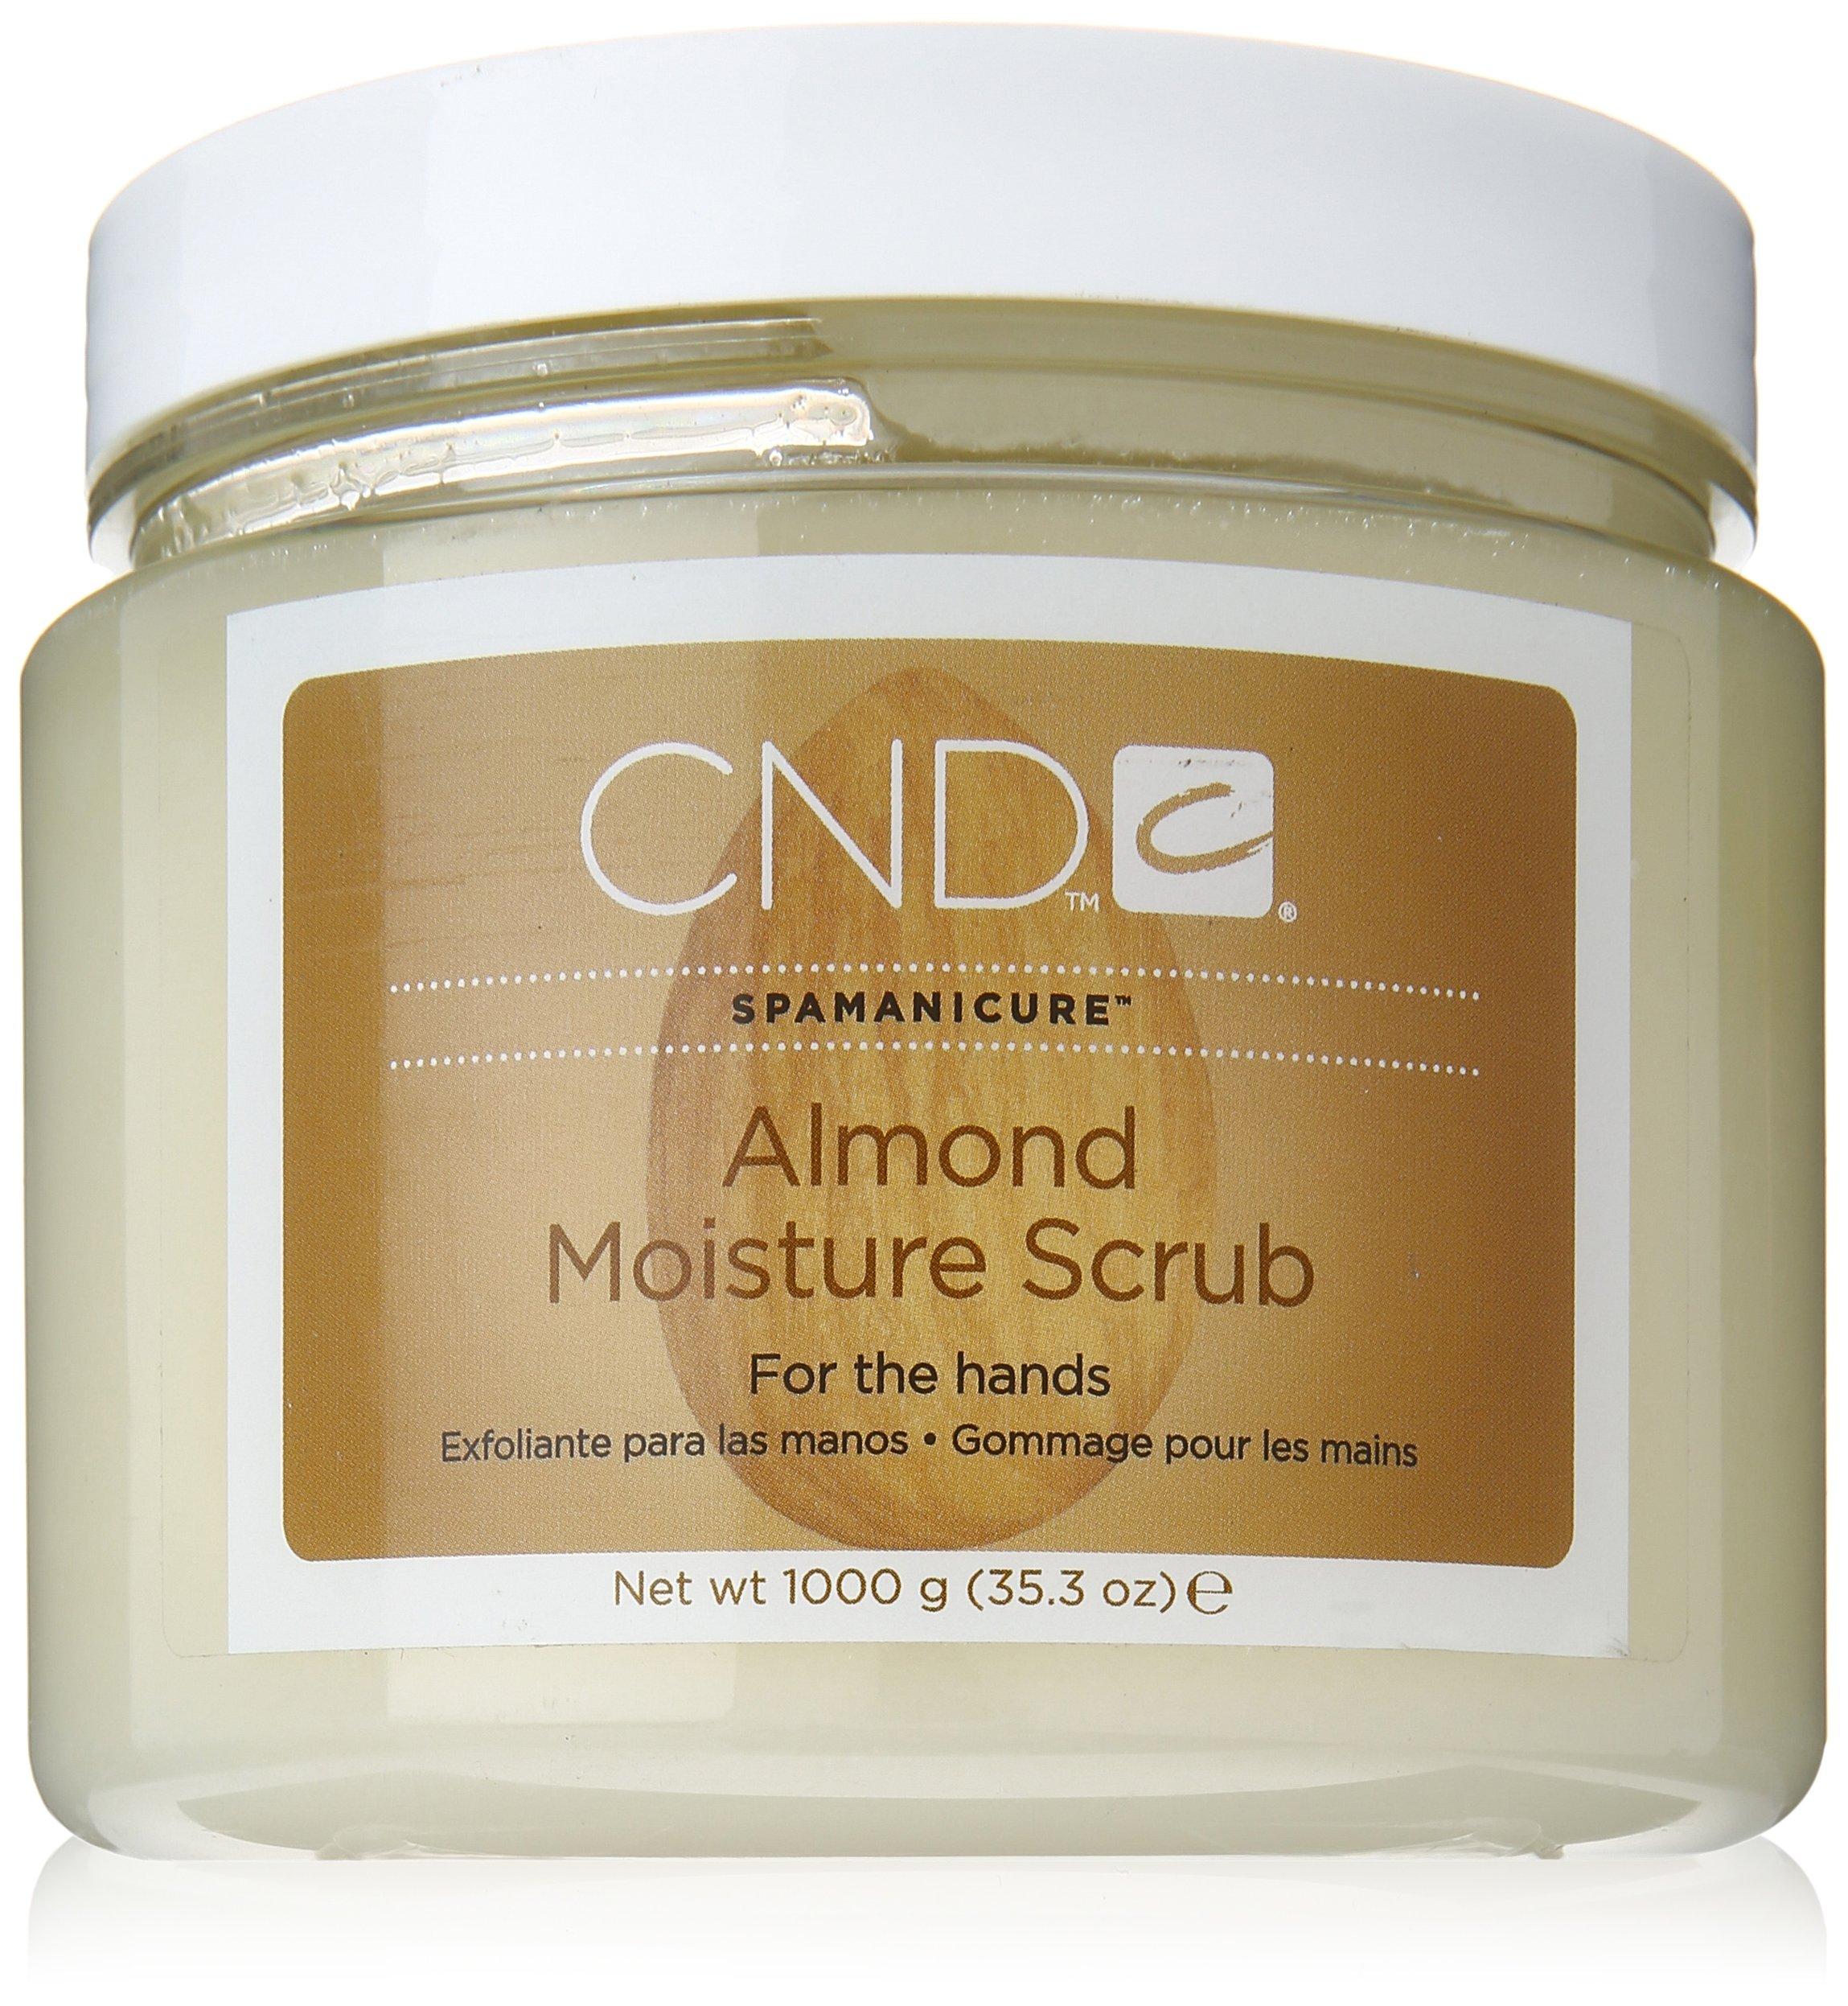 CND Almond Moisture Scrub, 35.29 fl. oz.